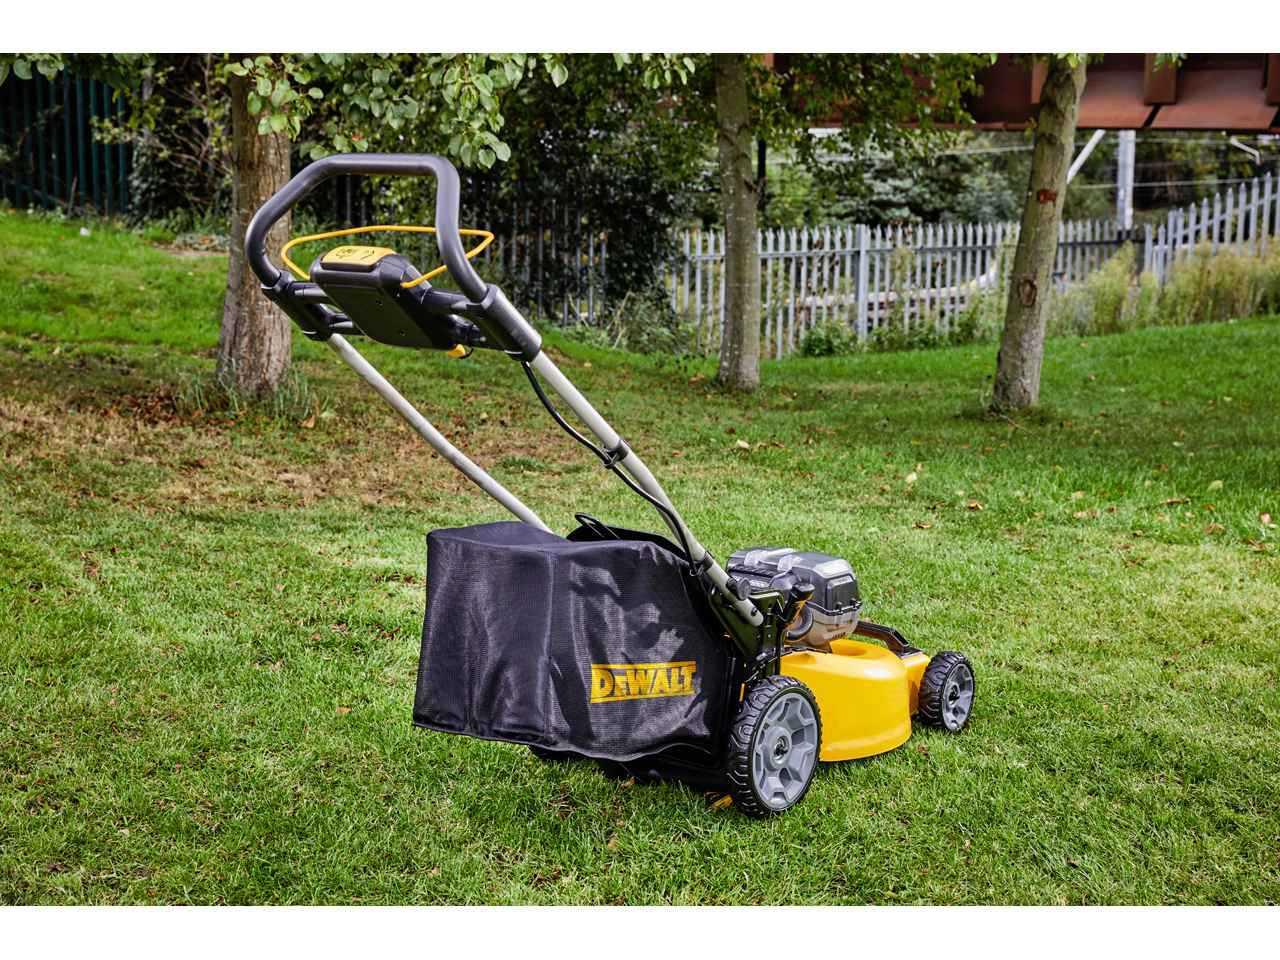 Dewalt DCMW564RN Twin 18v Bare 36v XR Cordless 48cm Lawn Mower Brushless